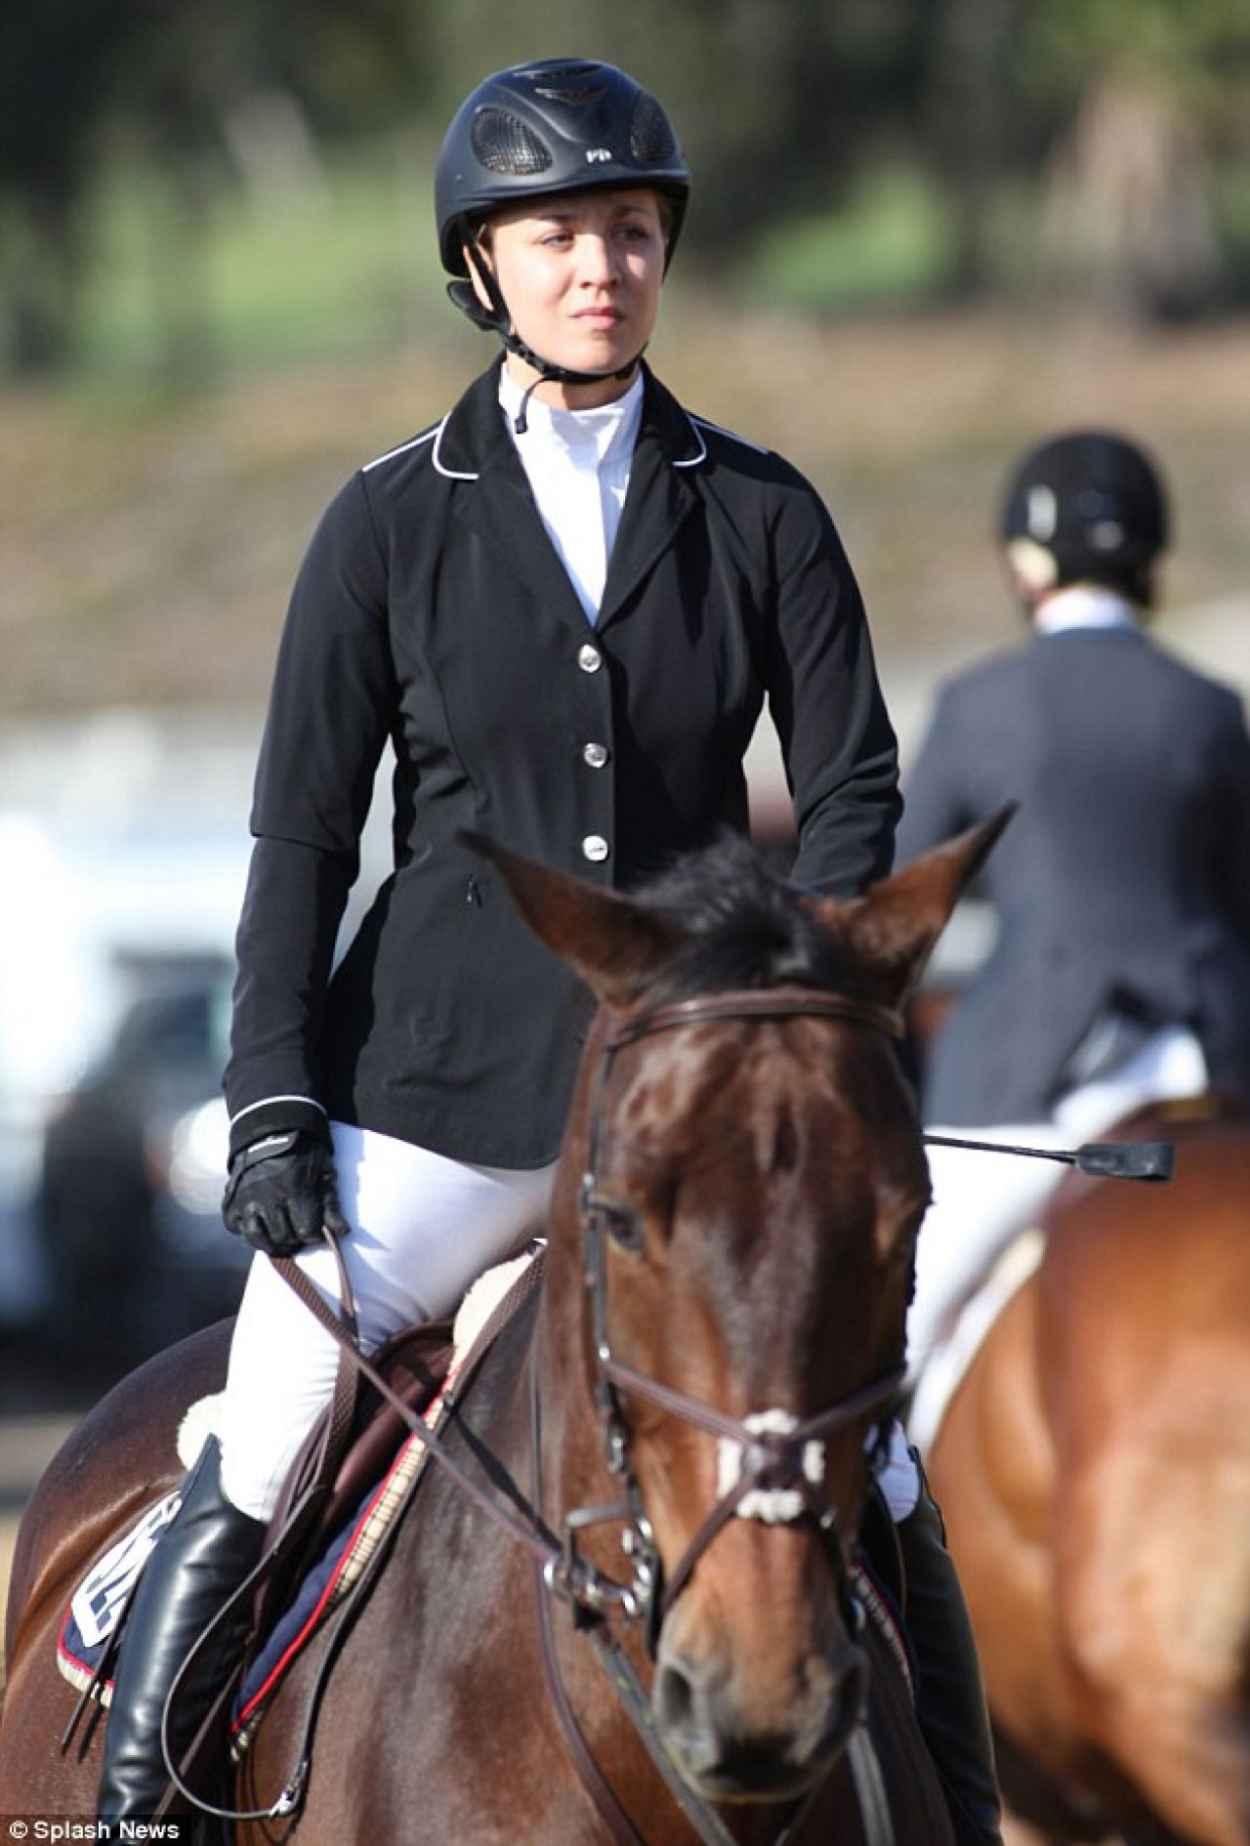 Kaley Cuoco Riding Her Horse -  afia-1